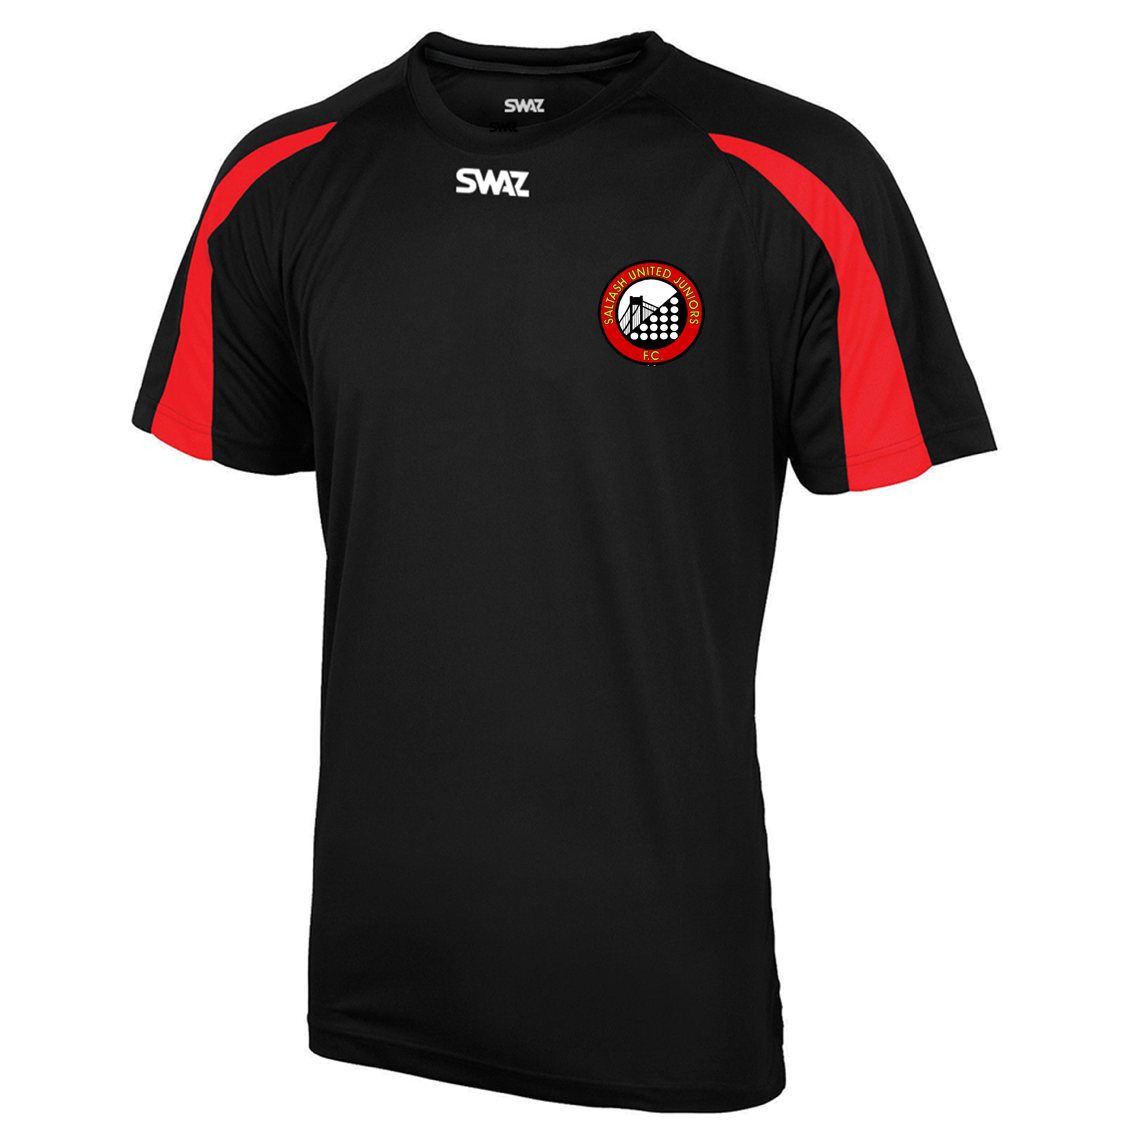 SWAZ Saltash United Juniors Adult Premier Training T-Shirt – Black/Red